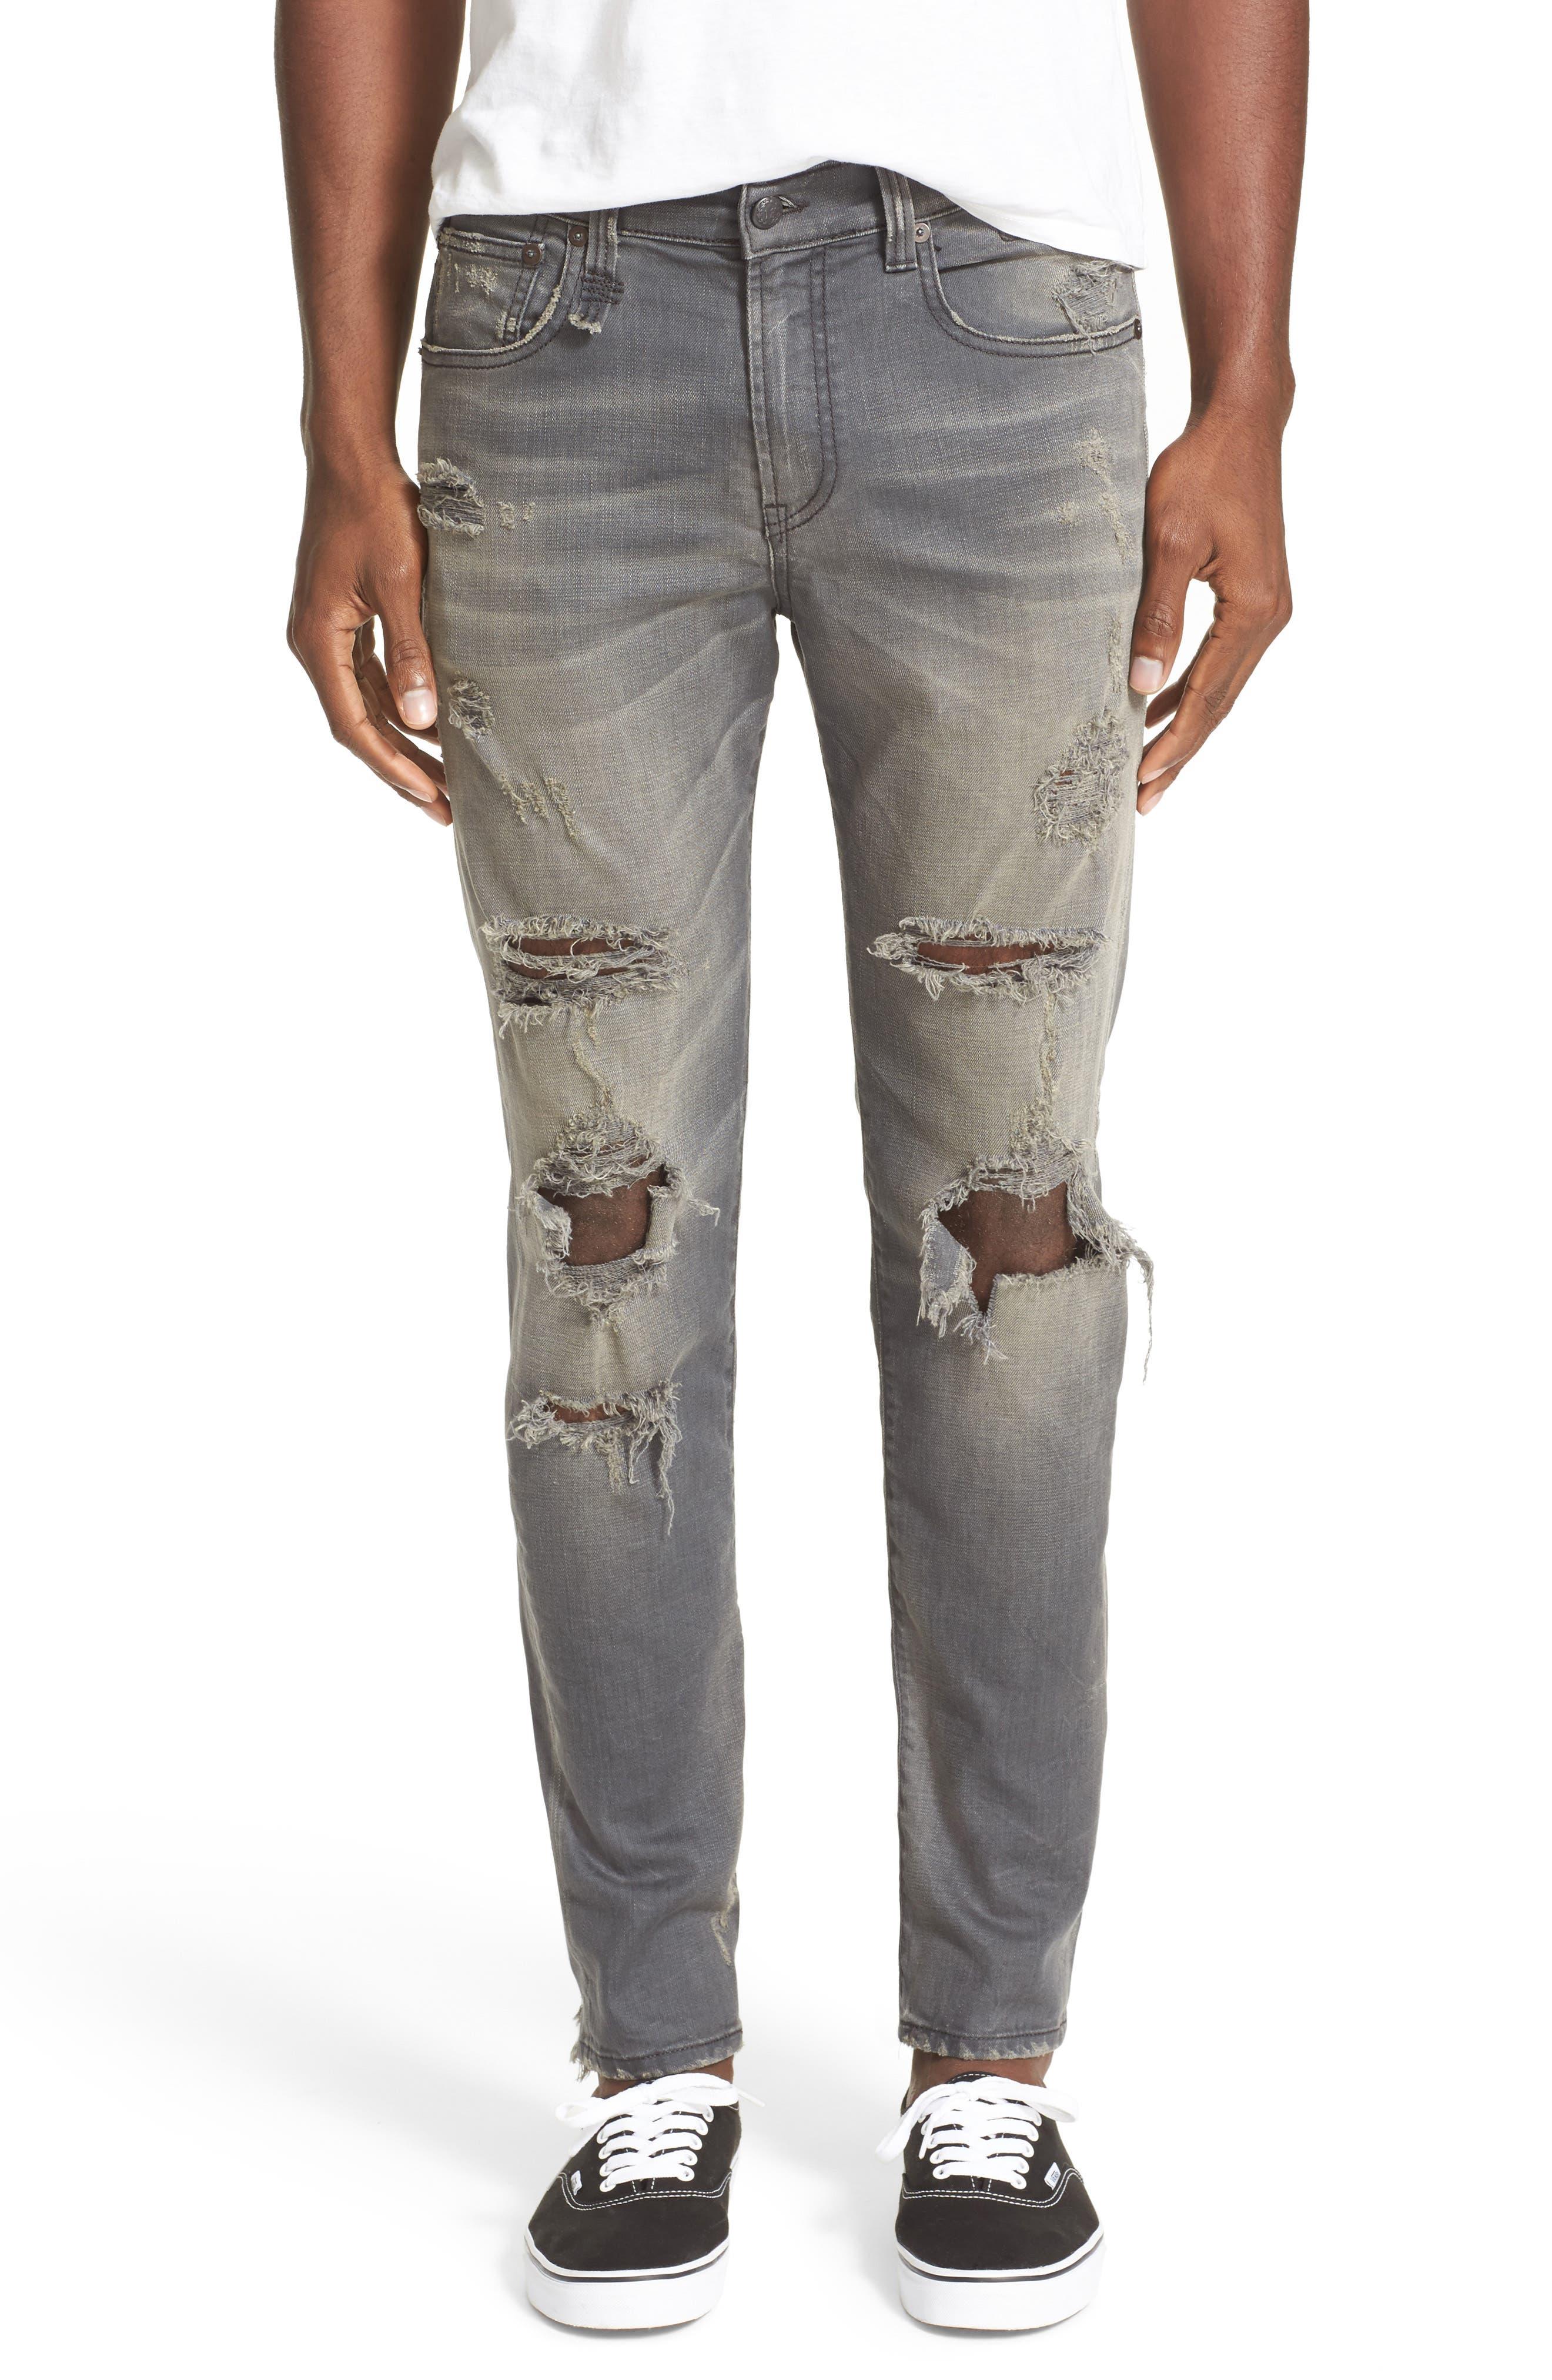 Skate Shredded Skinny Jeans,                             Main thumbnail 1, color,                             Grey